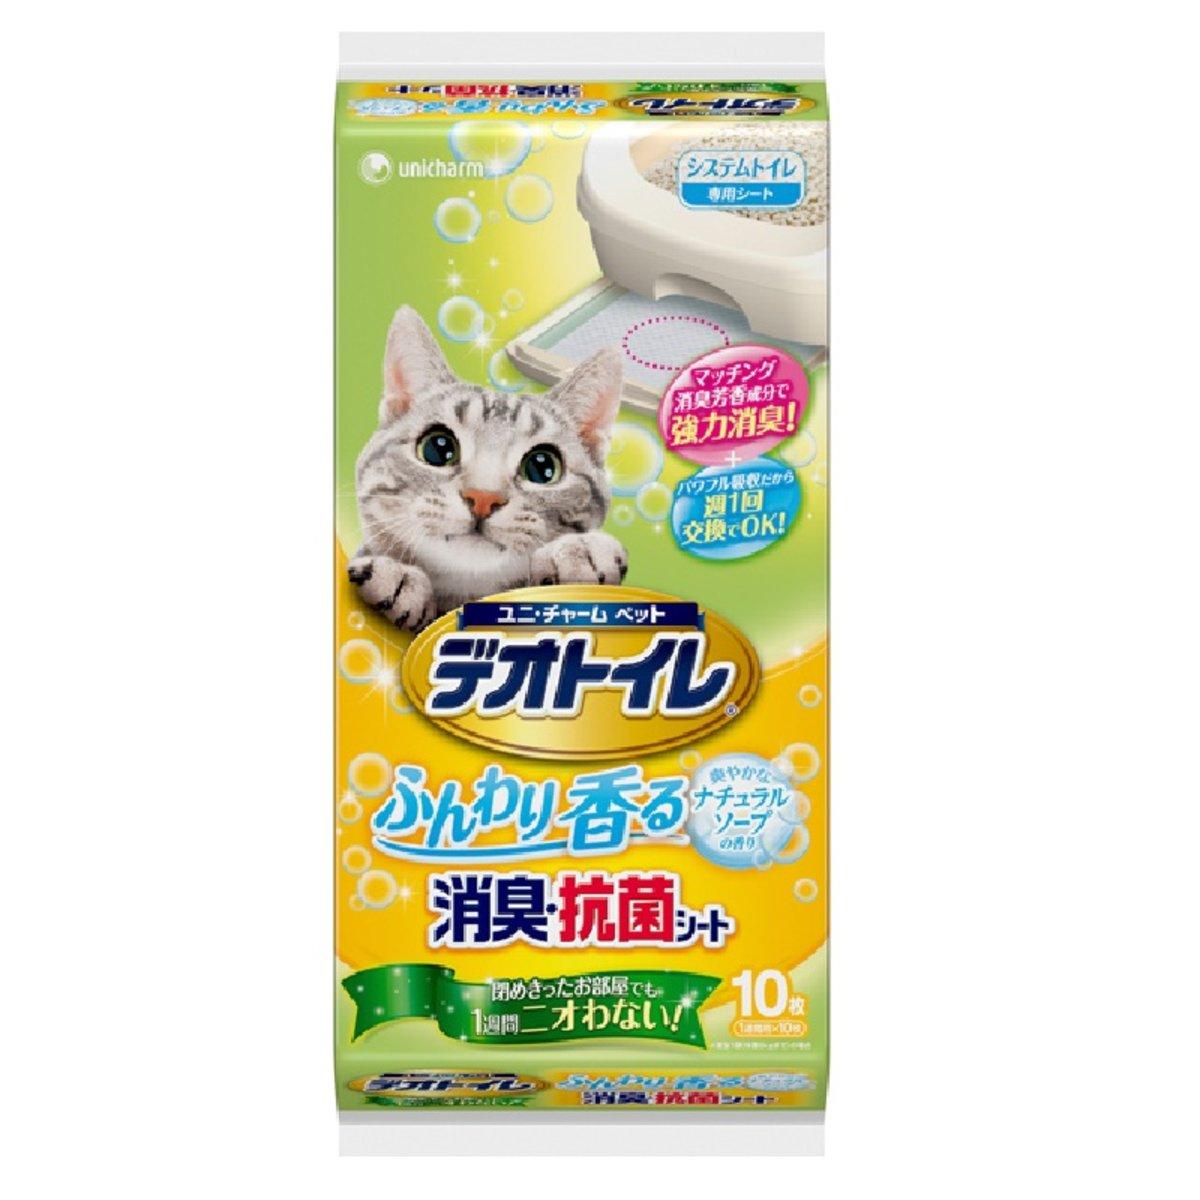 Unicharm Strong Deodorizing Antibacterial Cat Pad (Yellow) #Soap *Double-Layer Cat Litter * 10pcs